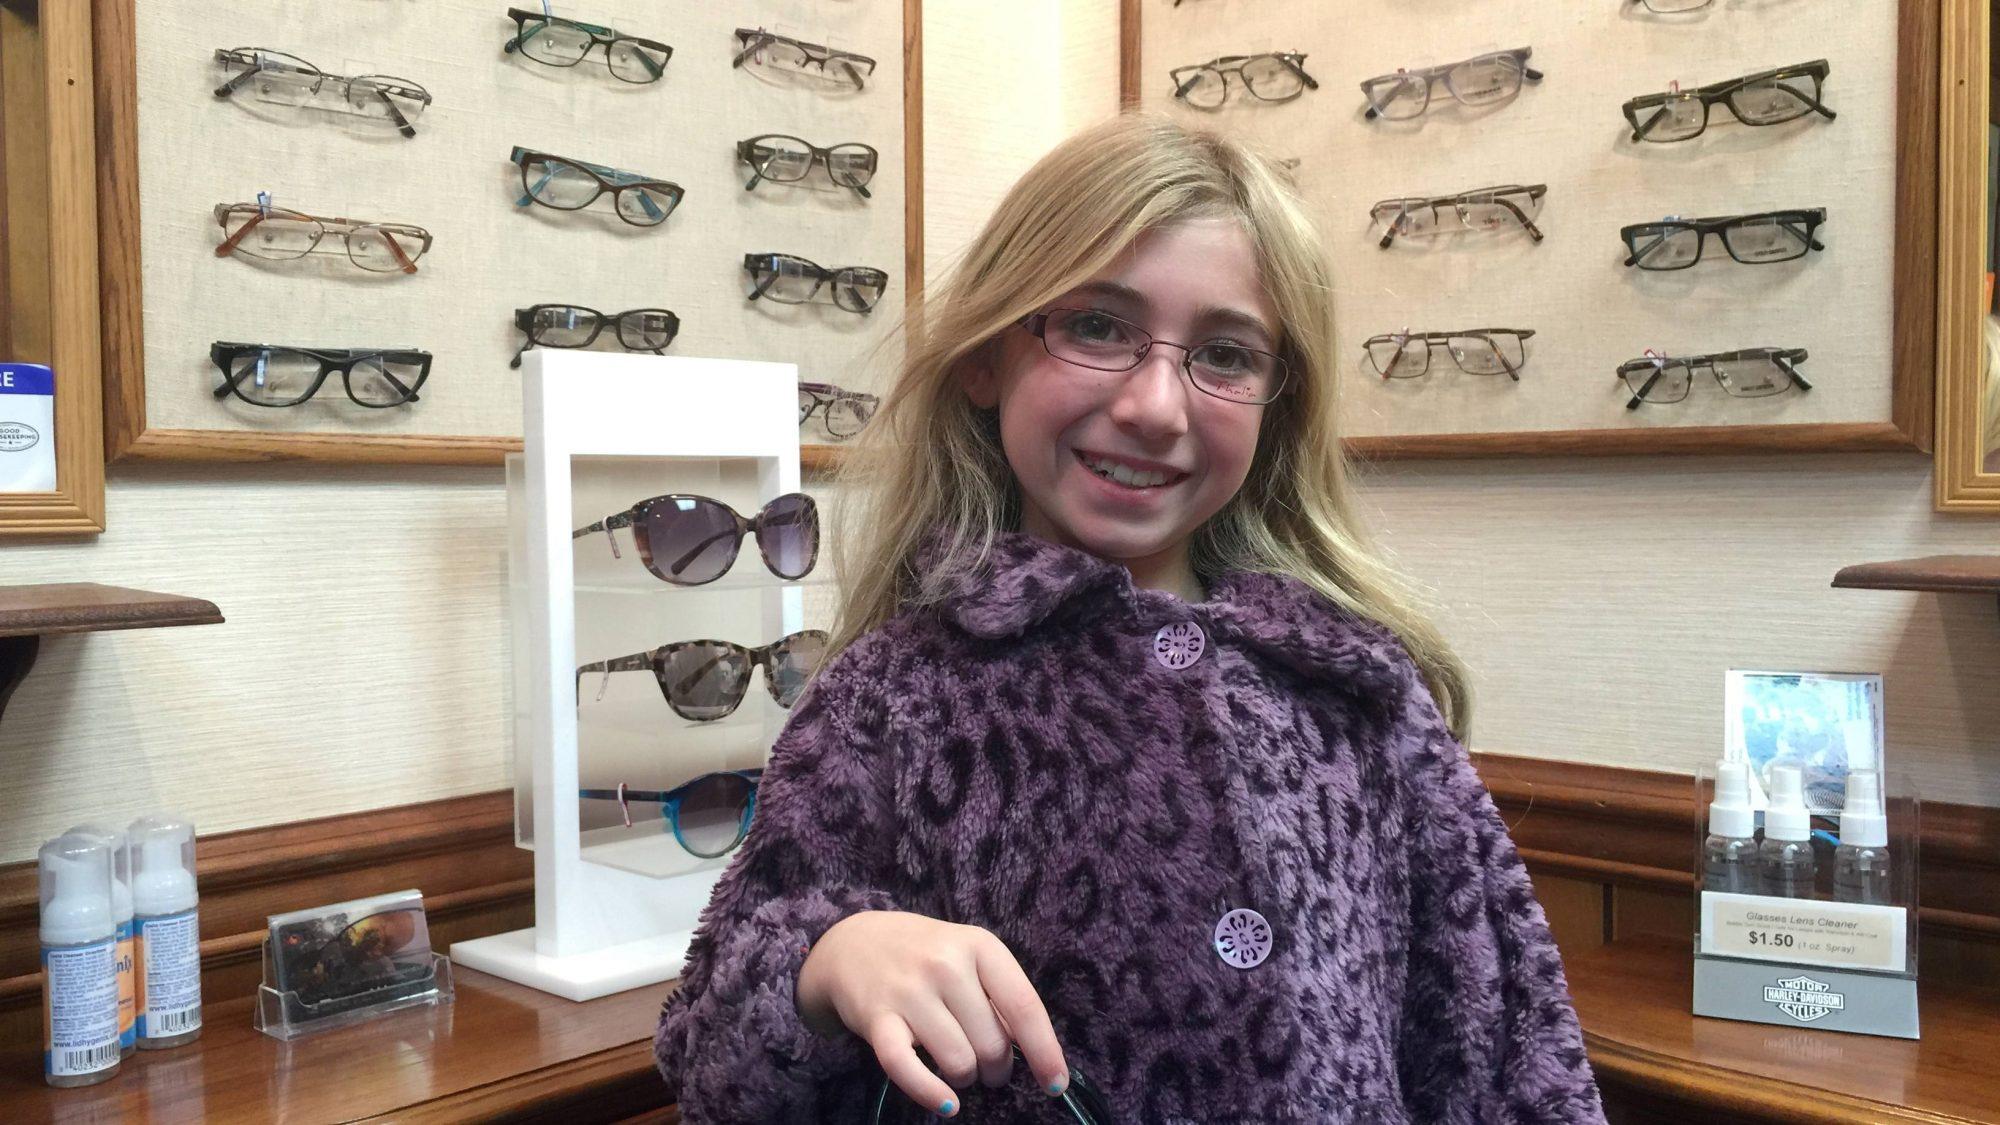 young-girl-glasses-purple-coat-e1517001990241